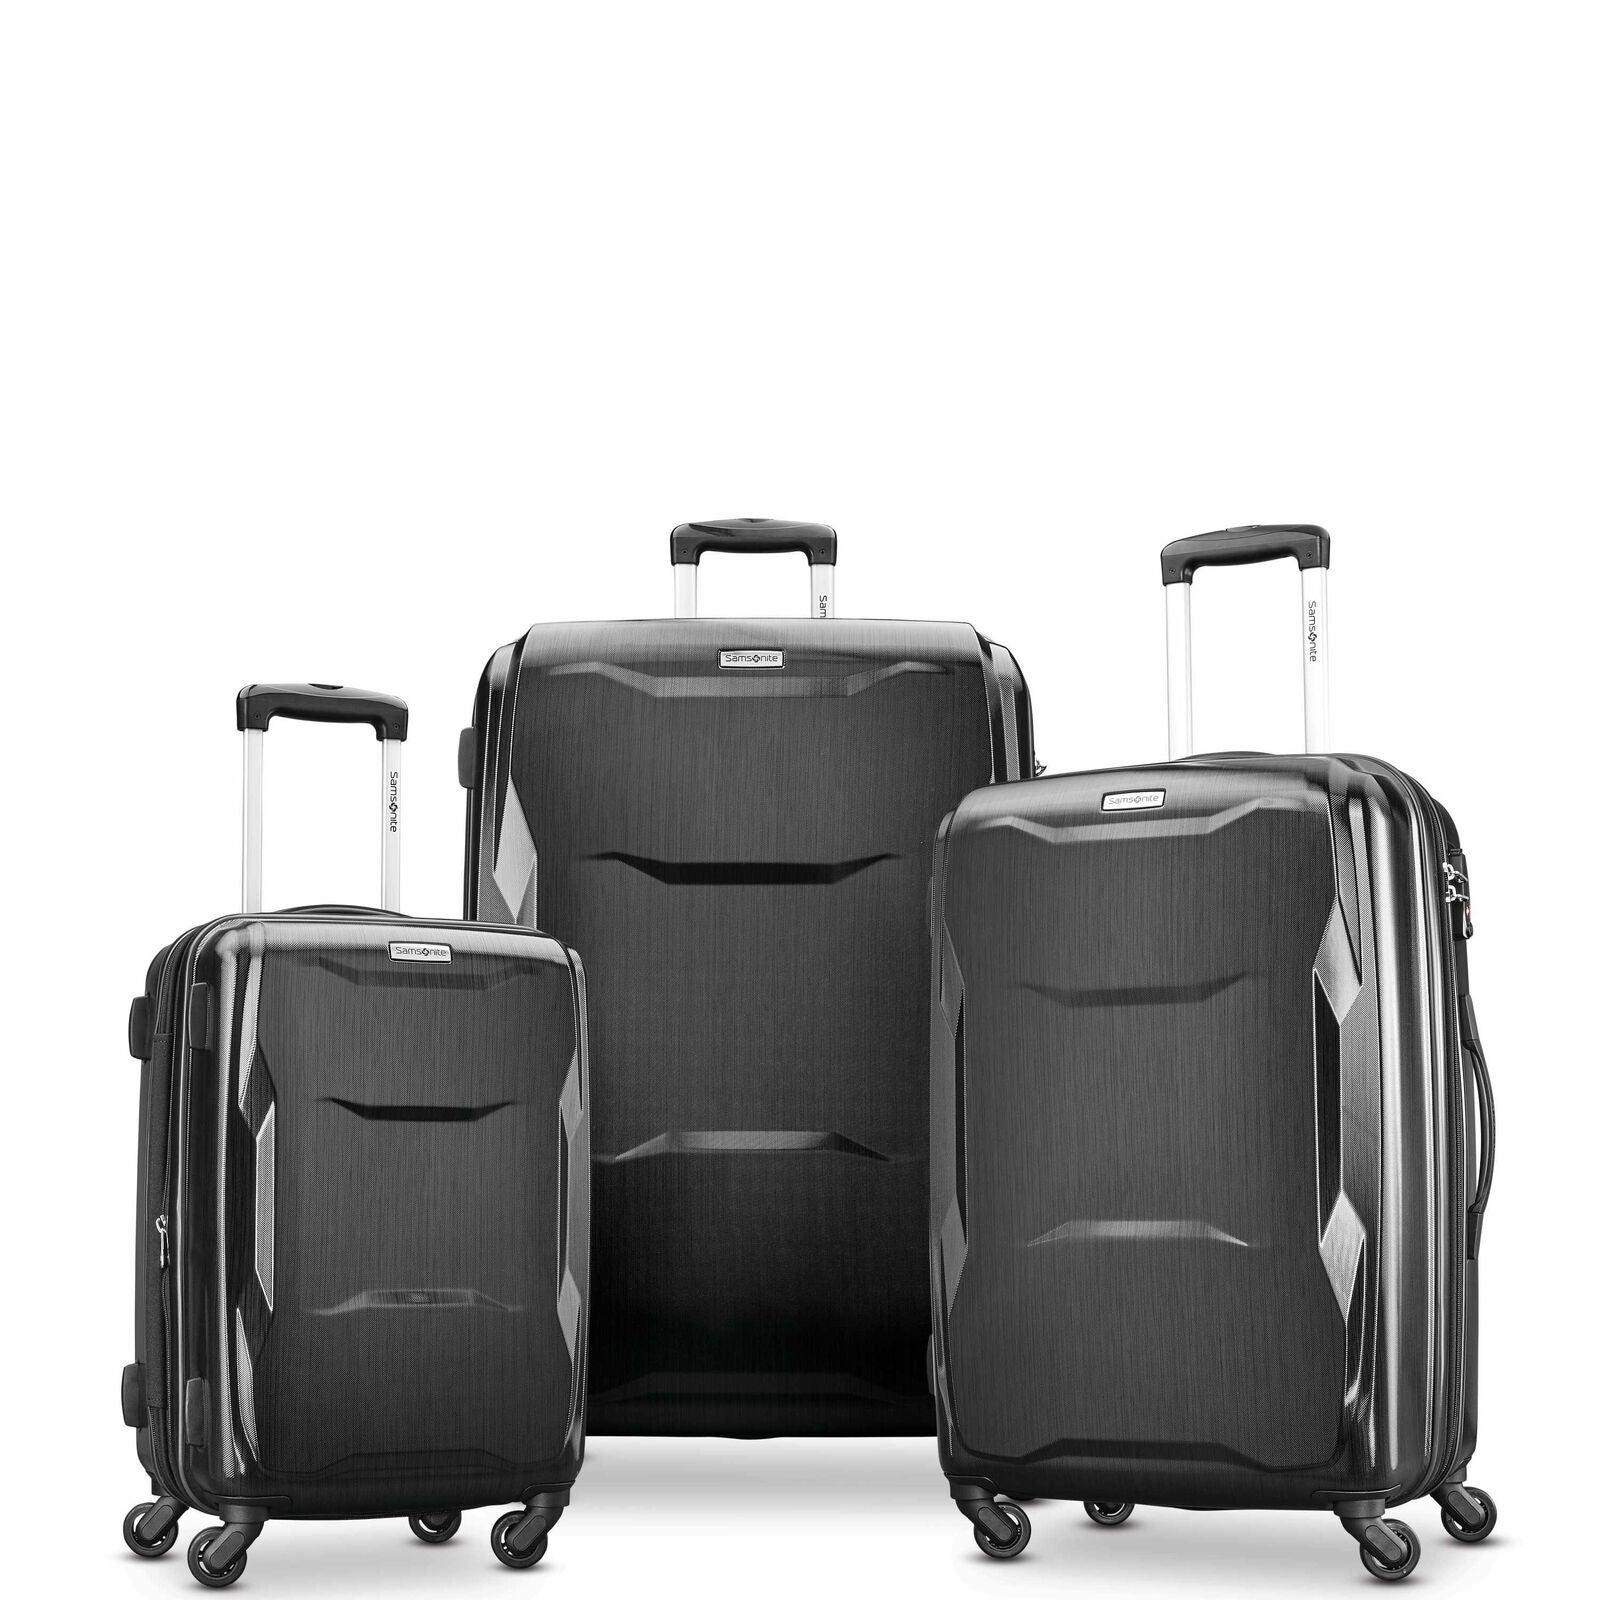 "3-Piece Samsonite Pivot Luggage Set (20"", 25"" & 29"", Various Colors)"